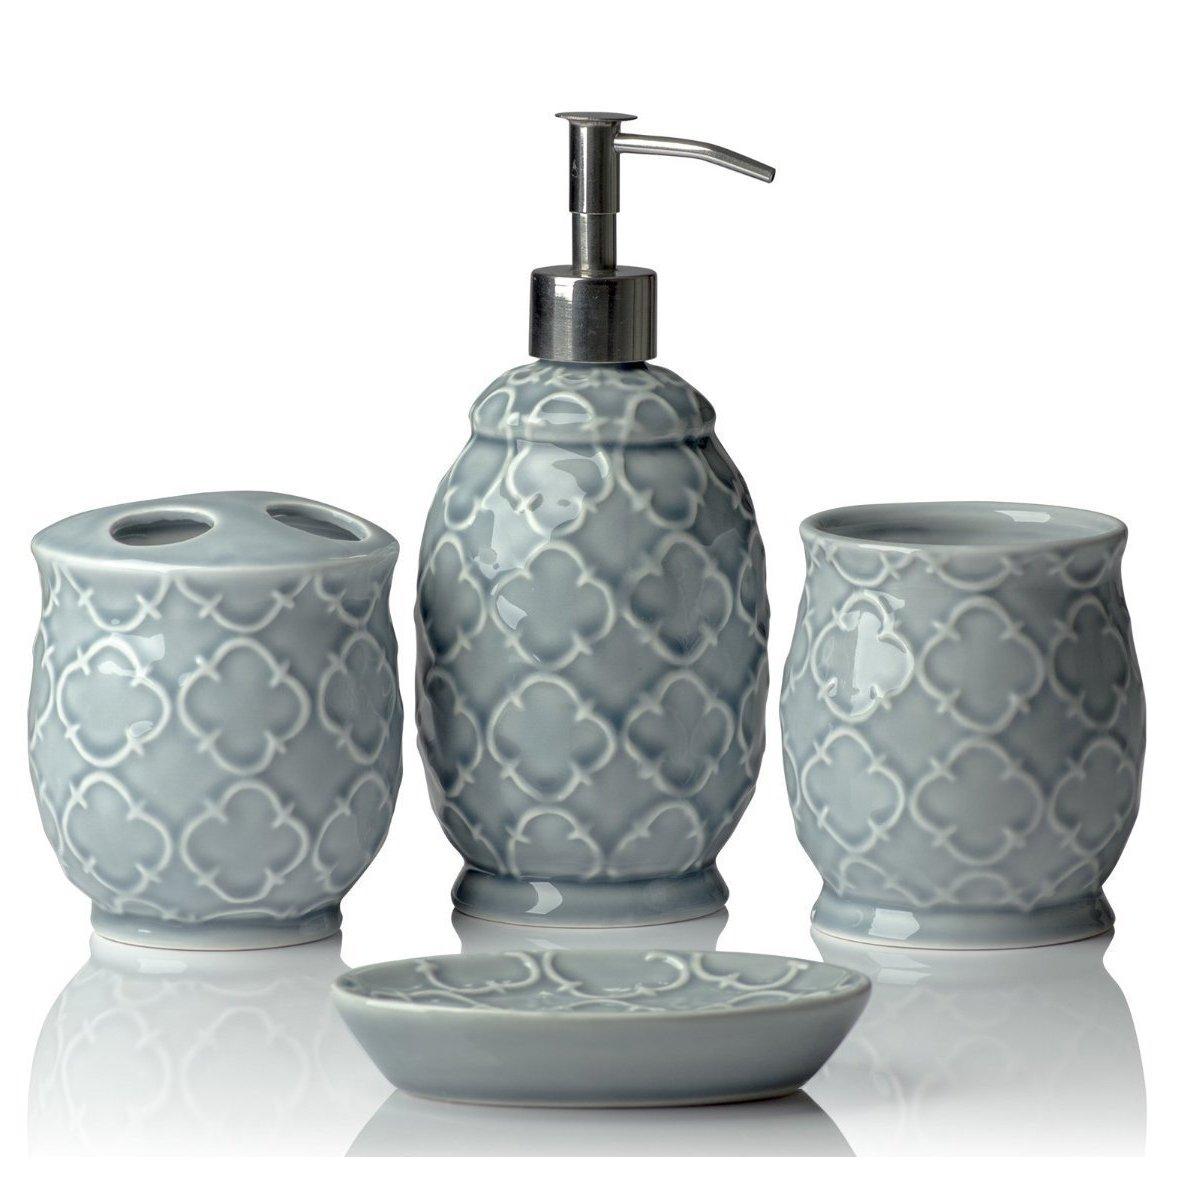 Designer 4-Piece Ceramic Bath Accessory Set | Includes Liquid Soap or Lotion Dispenser w/Toothbrush Holder, Tumbler, Soap Dish | Moroccan Trellis | Contour Grey